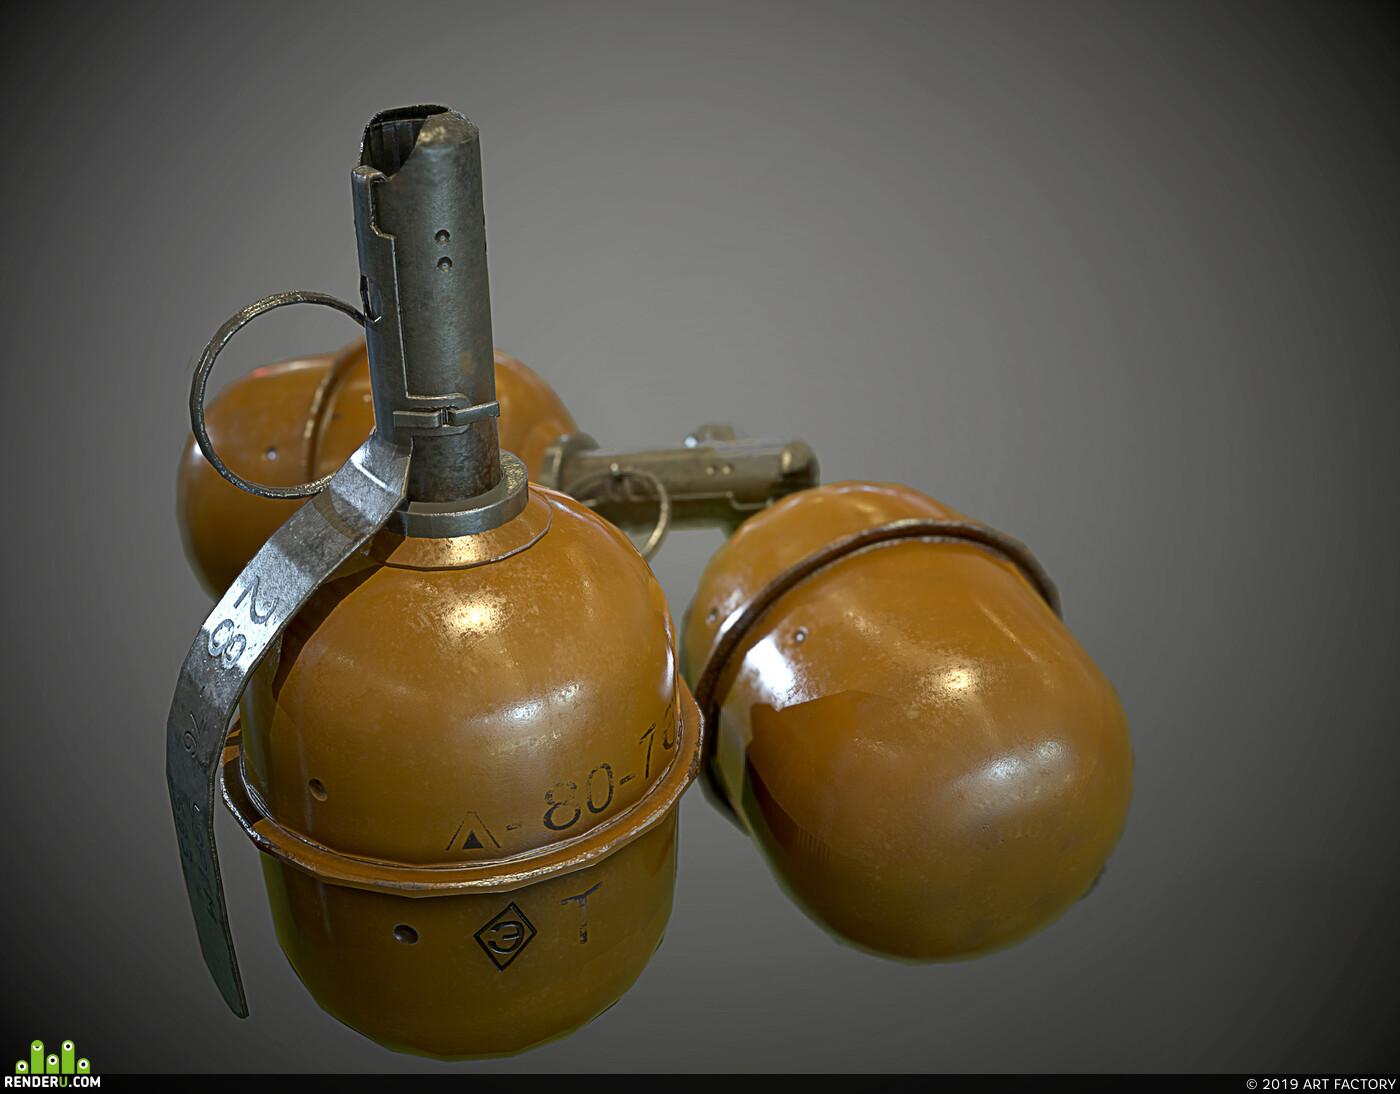 F1 grenade and RGD 5 (TNT) - World War II